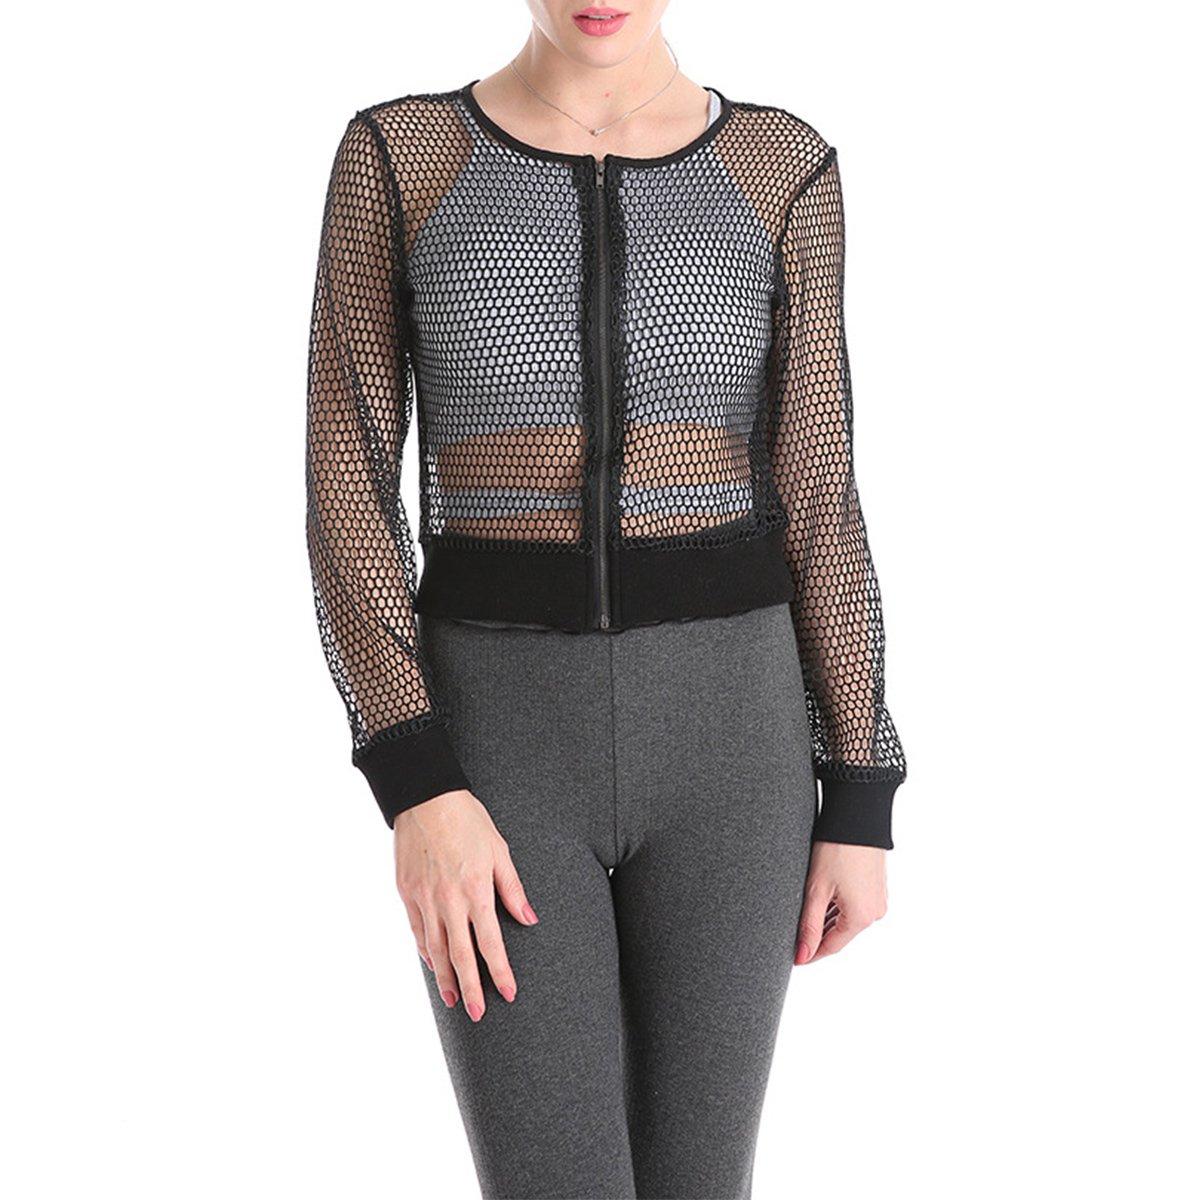 Yogurt Women Fishnet Coat Sheer Mesh Long Sleeve Zipper Short Bomber Jacket Size L (Black)